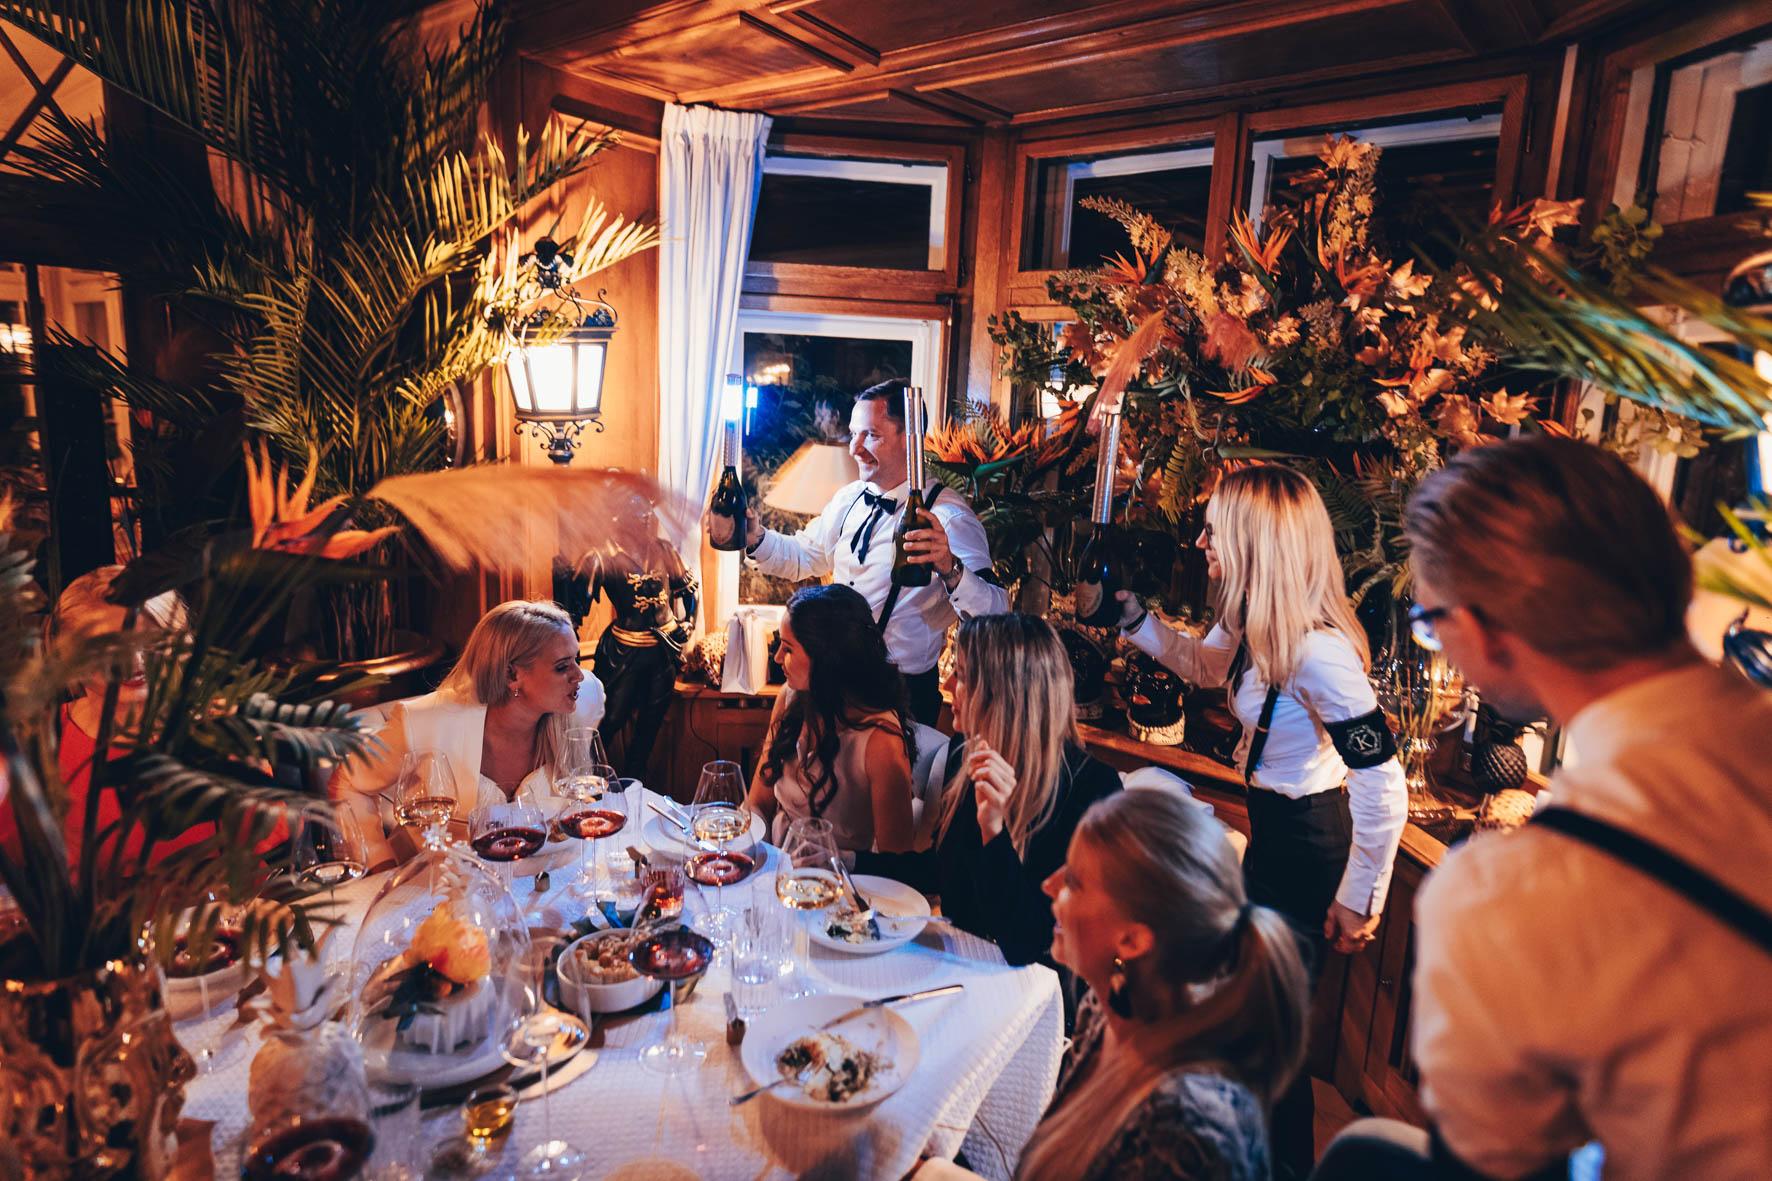 Konrad-lifestyle-art-basel-%22grand-party%22-2019-82.jpg